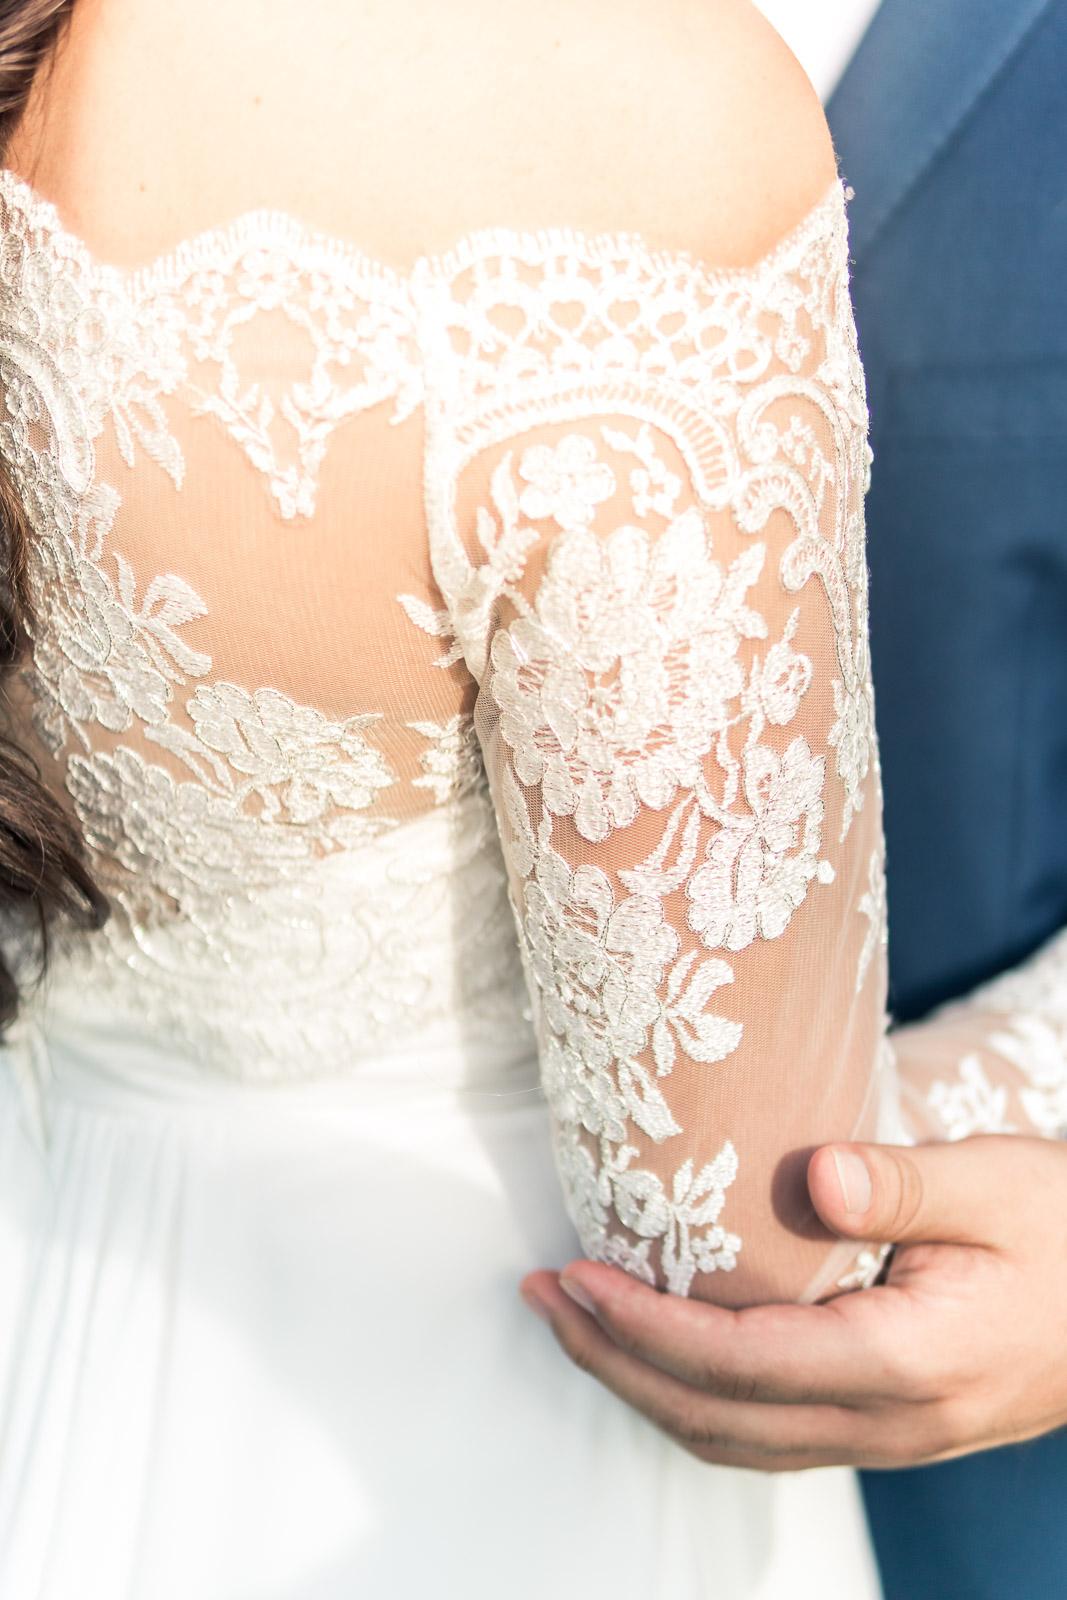 72_Angel-Brea-Orange-County_Joseph-Barber-Wedding-Photography.jpg